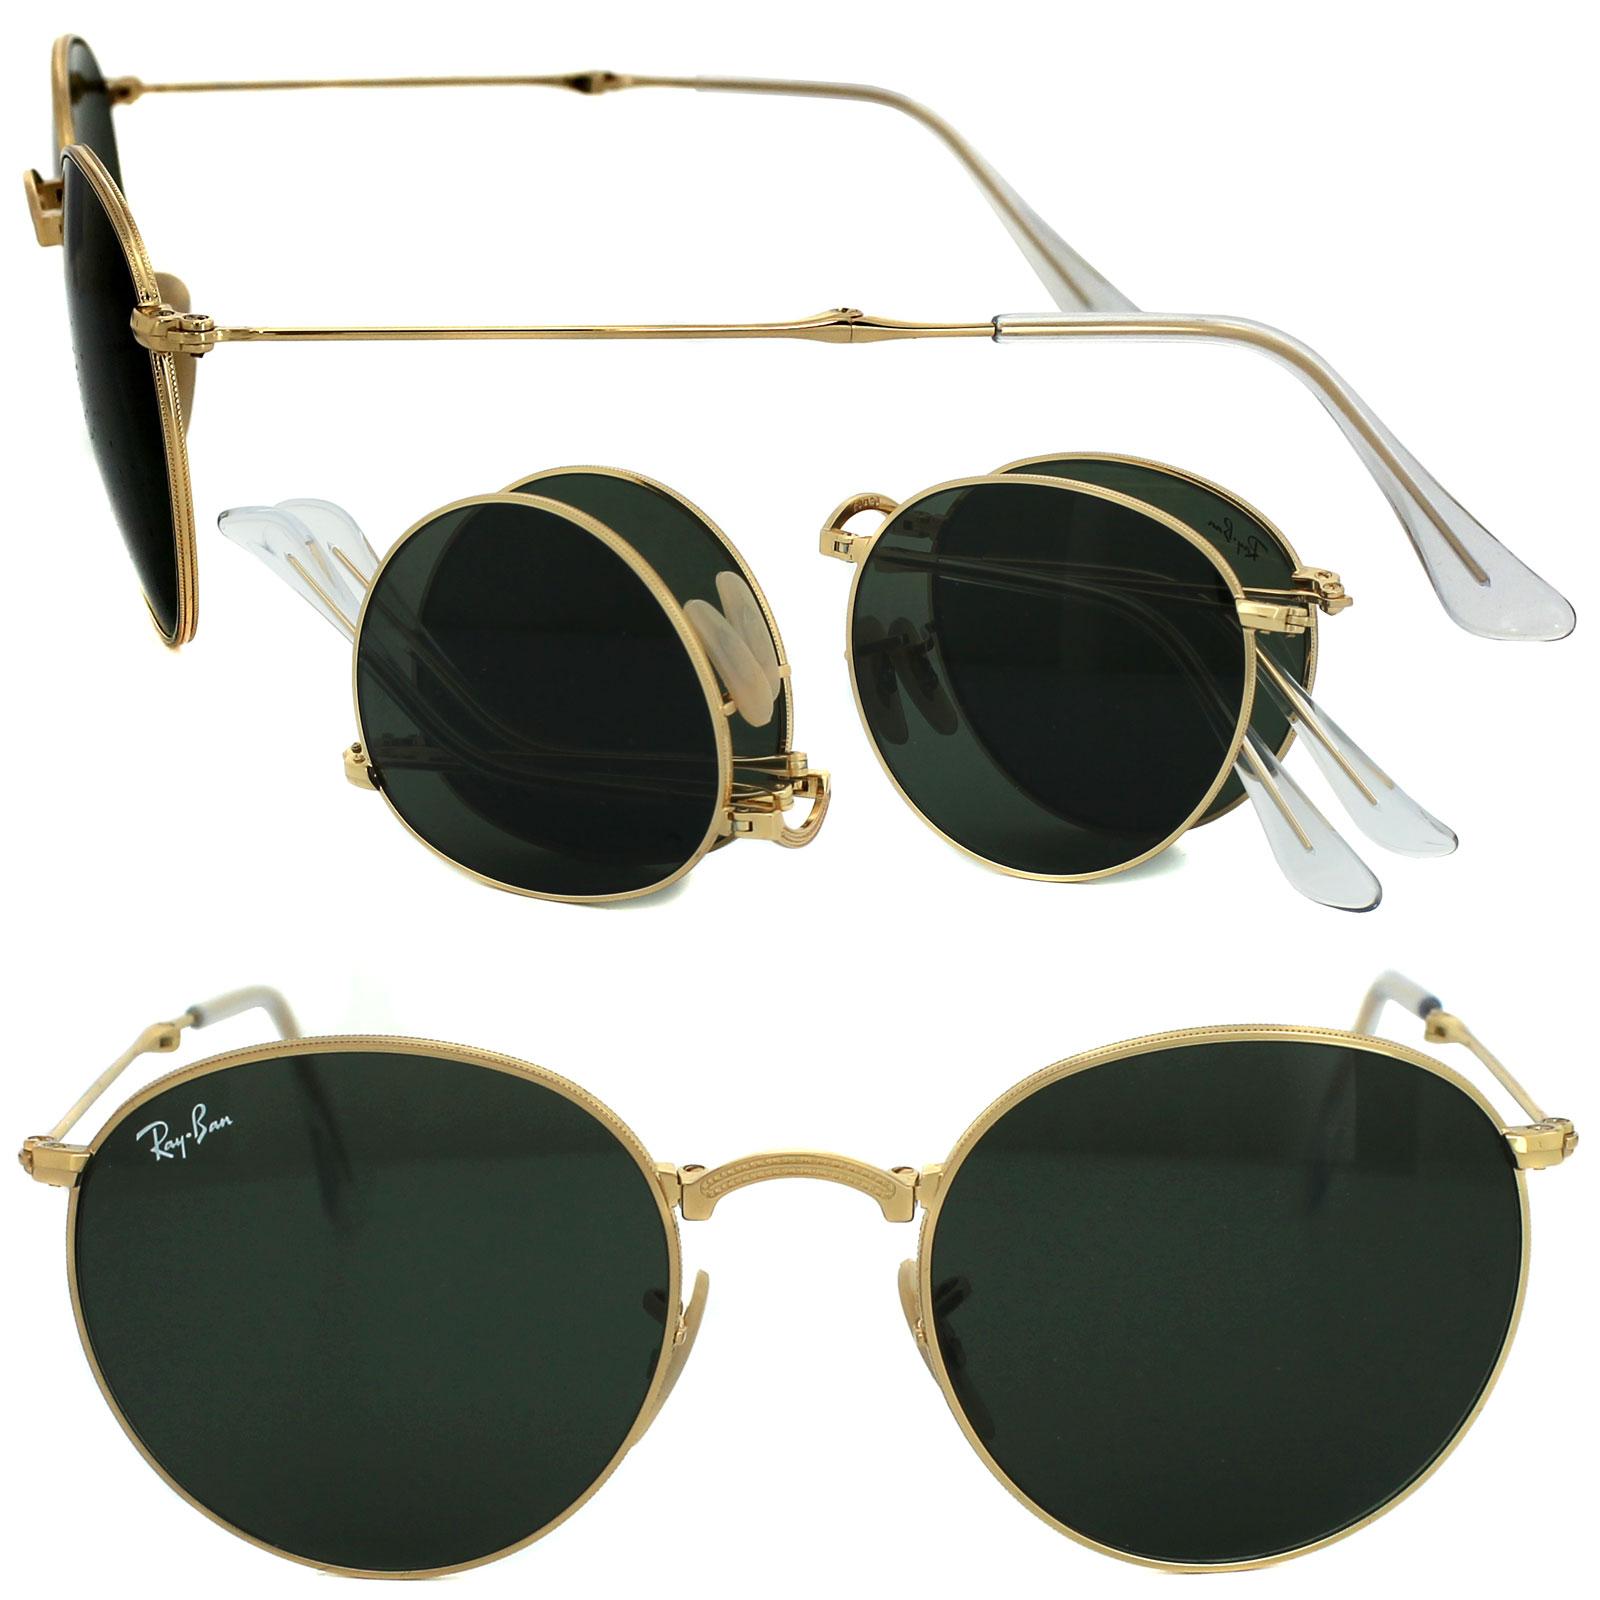 2594ebb7f12f9 Cheap Ray-Ban Round Folding 3532 Sunglasses - Discounted Sunglasses